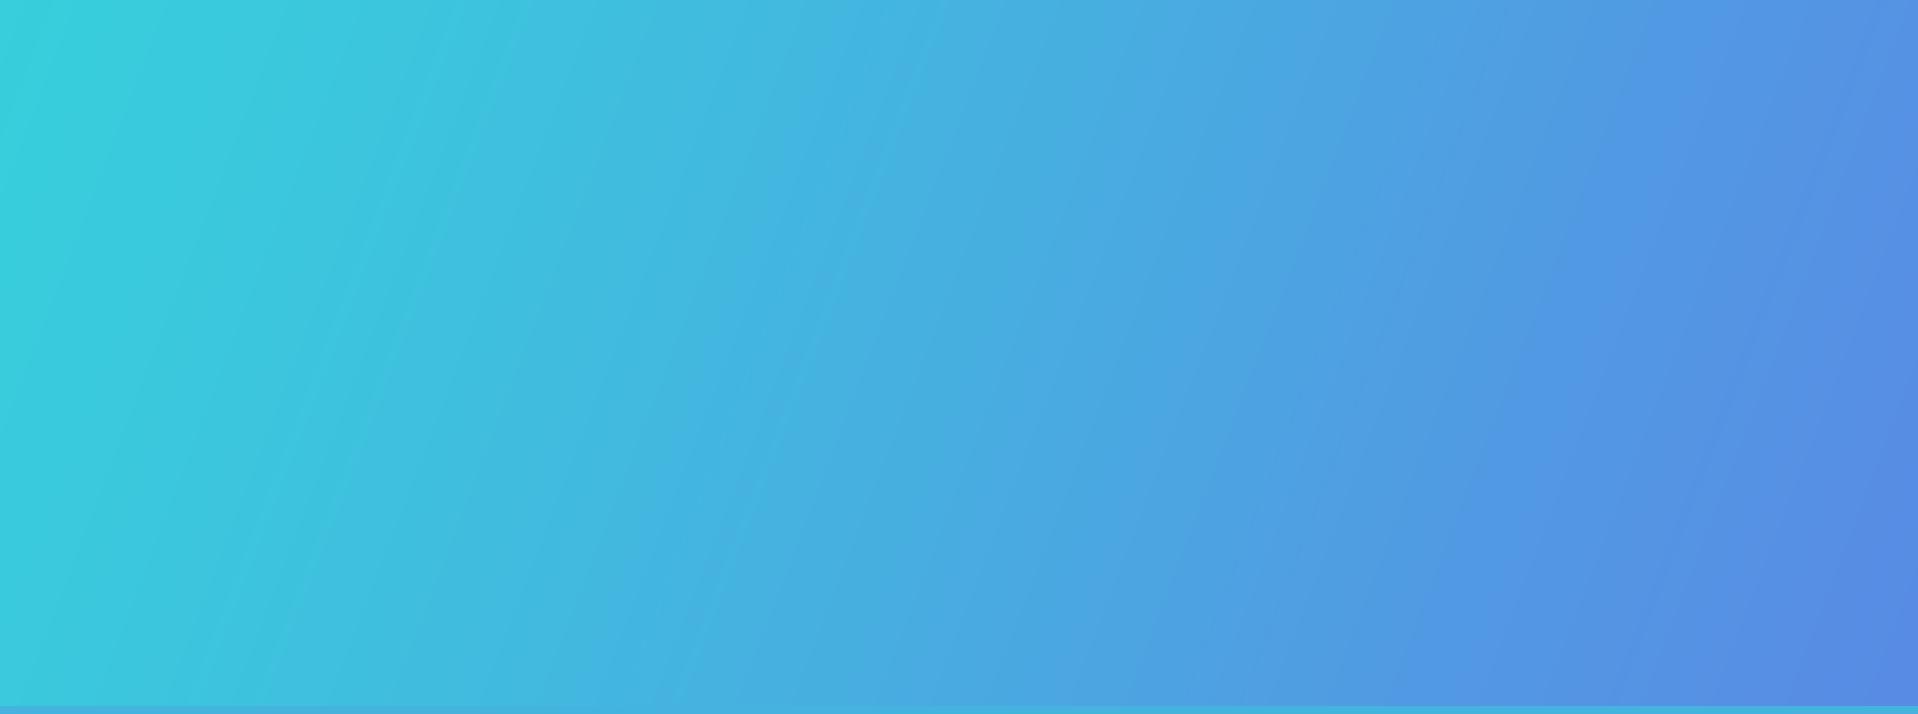 Blue Top Separator